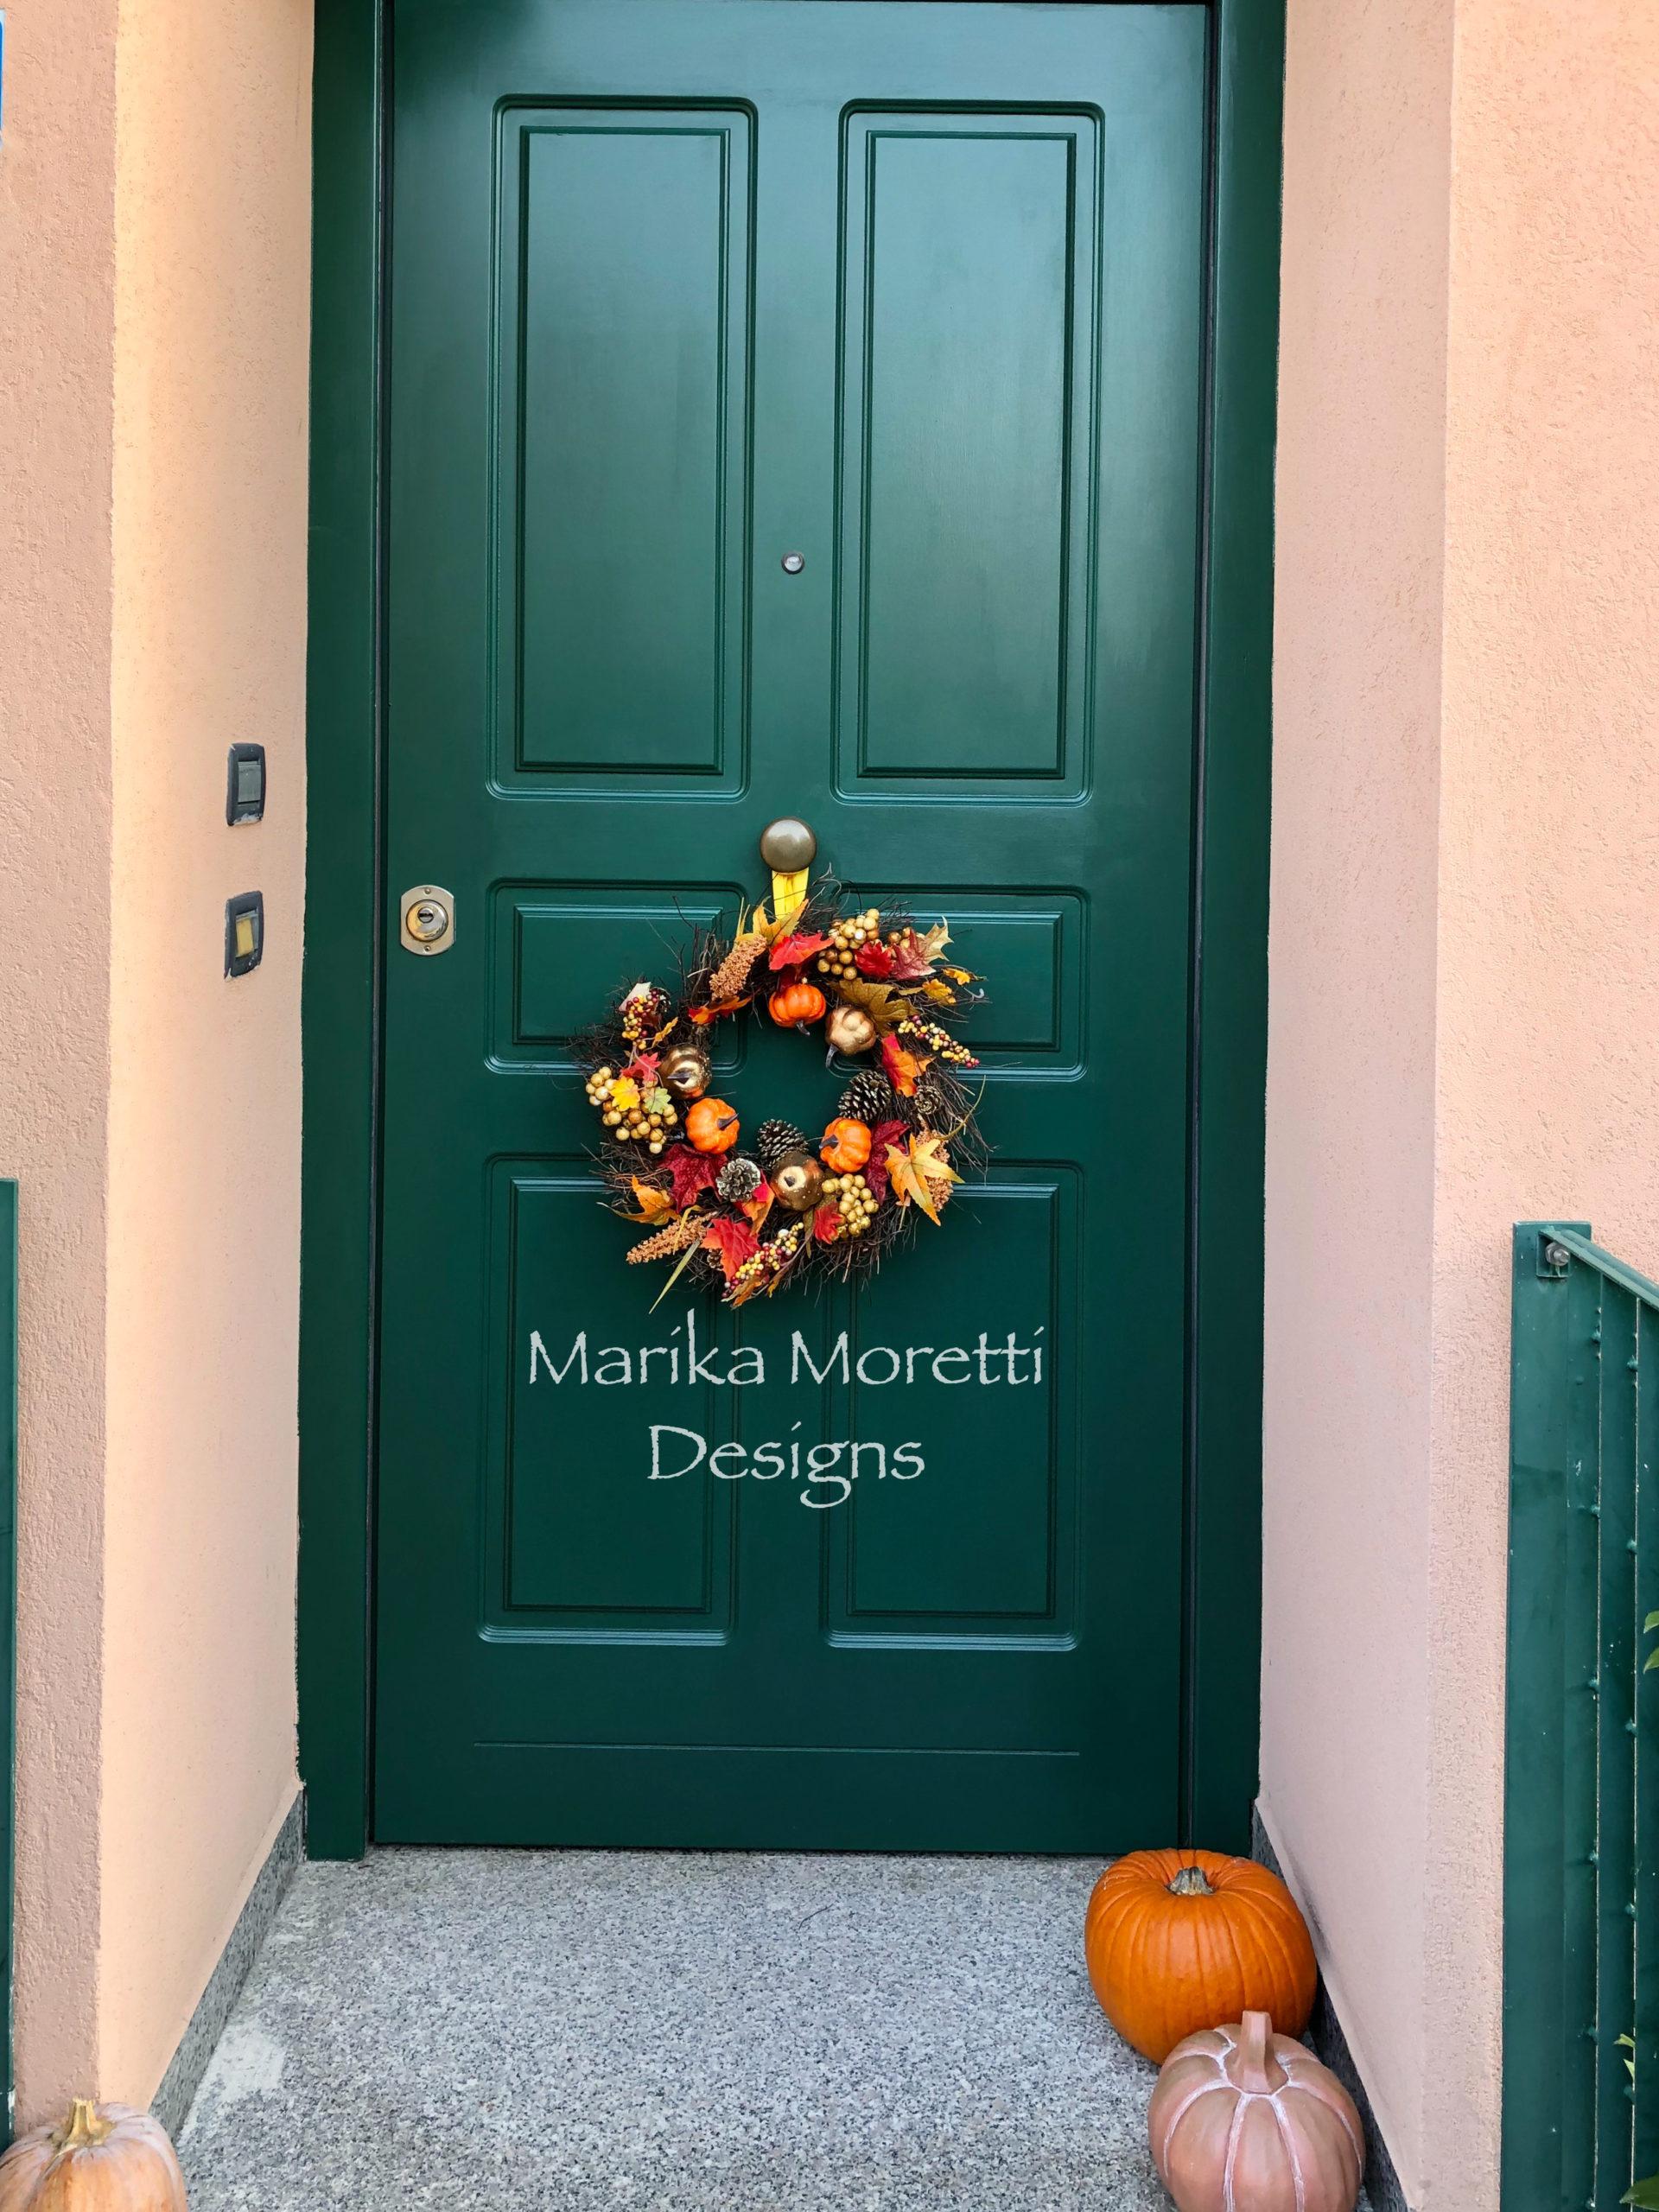 Dipingere la porta di casa